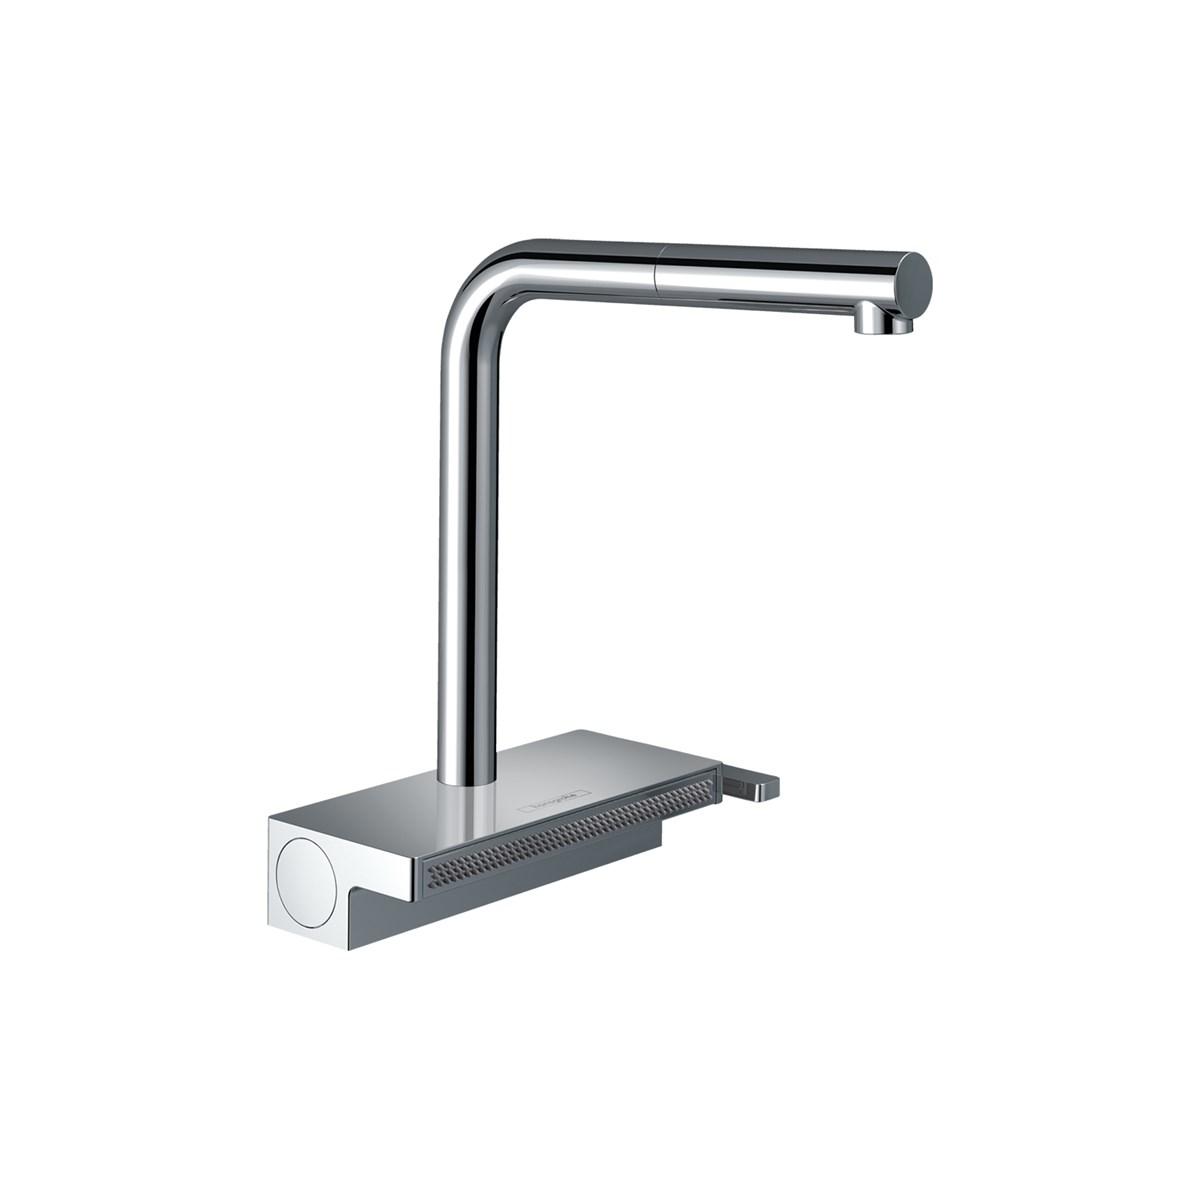 Hansgrohe-Aquno-Select-M81-Kitchen-Mixer-250-73830000-Matisse-1